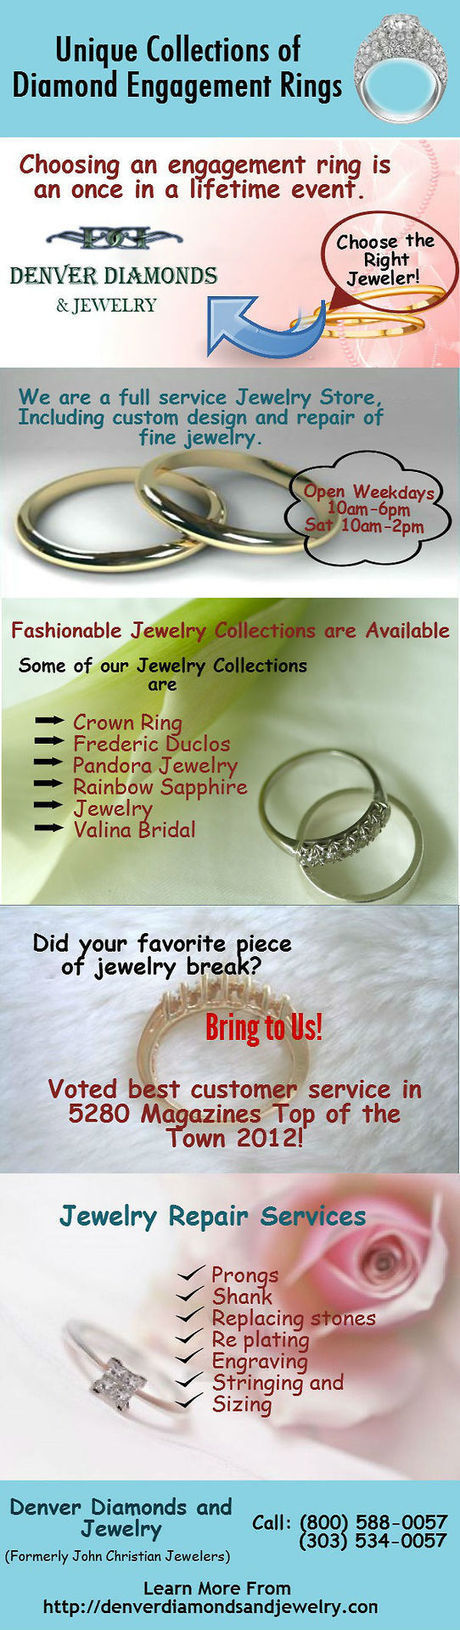 Denver Diamonds and Jewelry   Denver Diamonds and Jewelry   Scoop.it